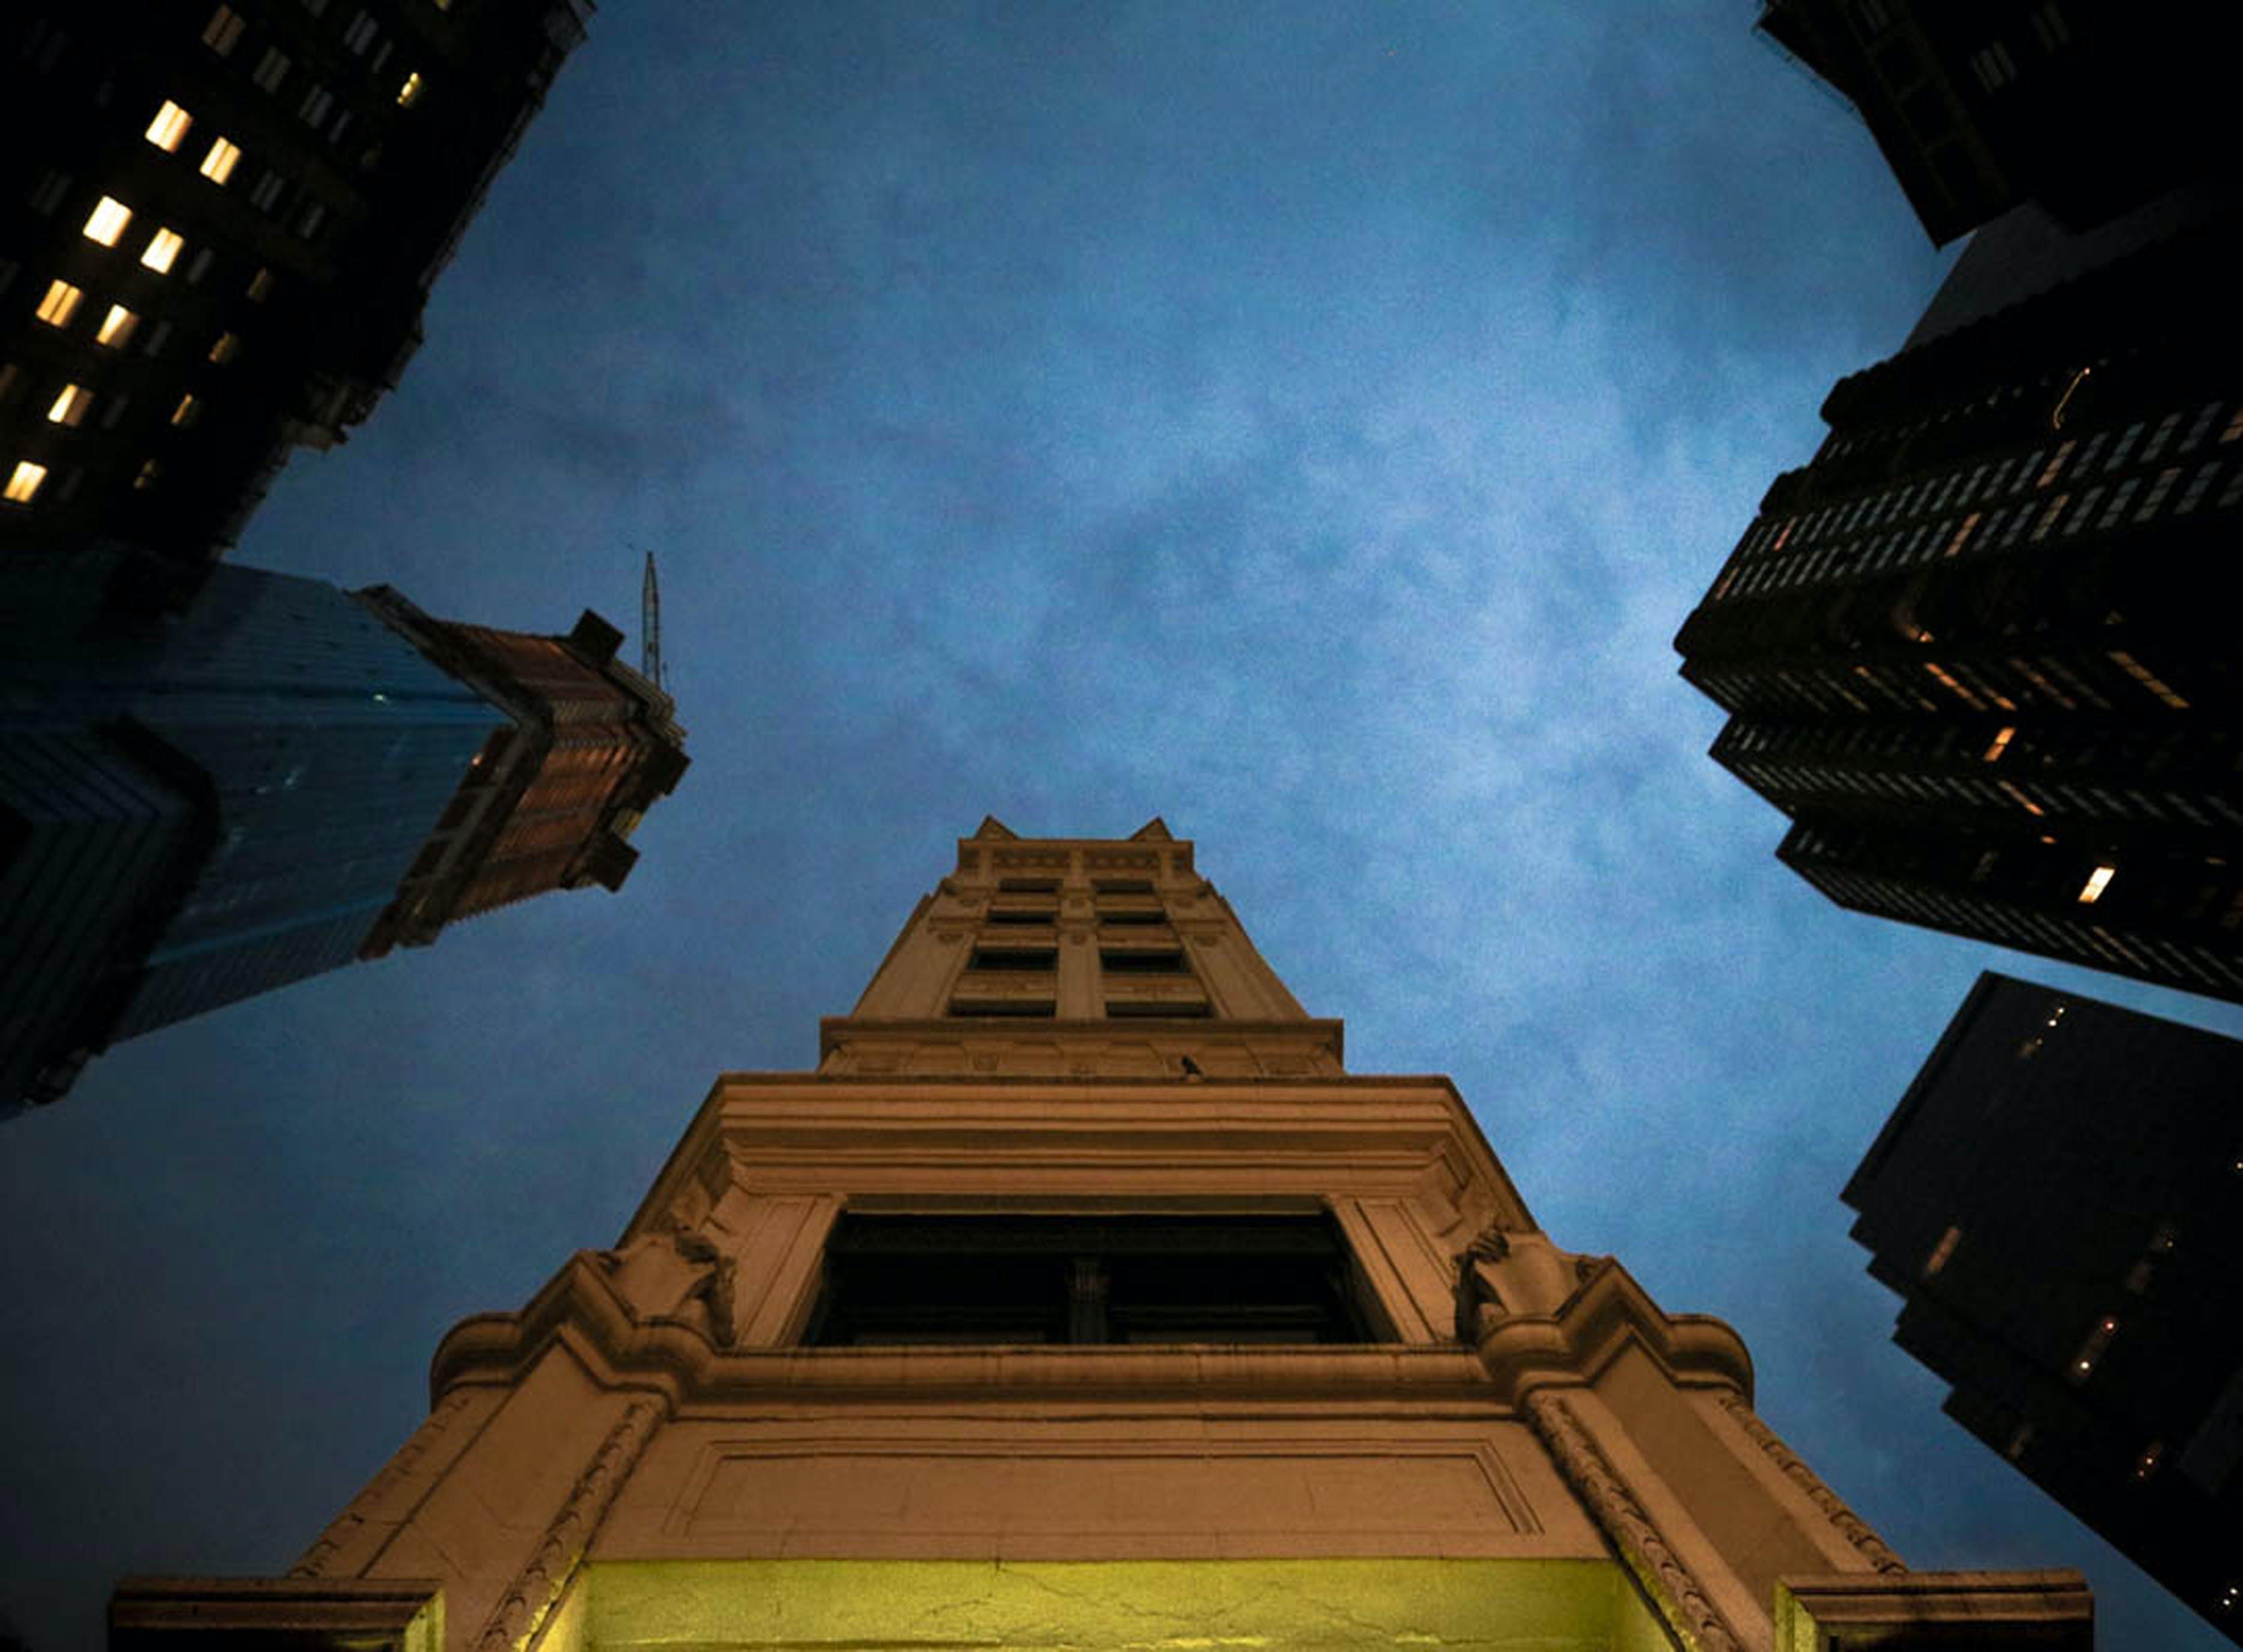 Free stock photo of #Cityscape, #evening skes, #manhattan, #midtown